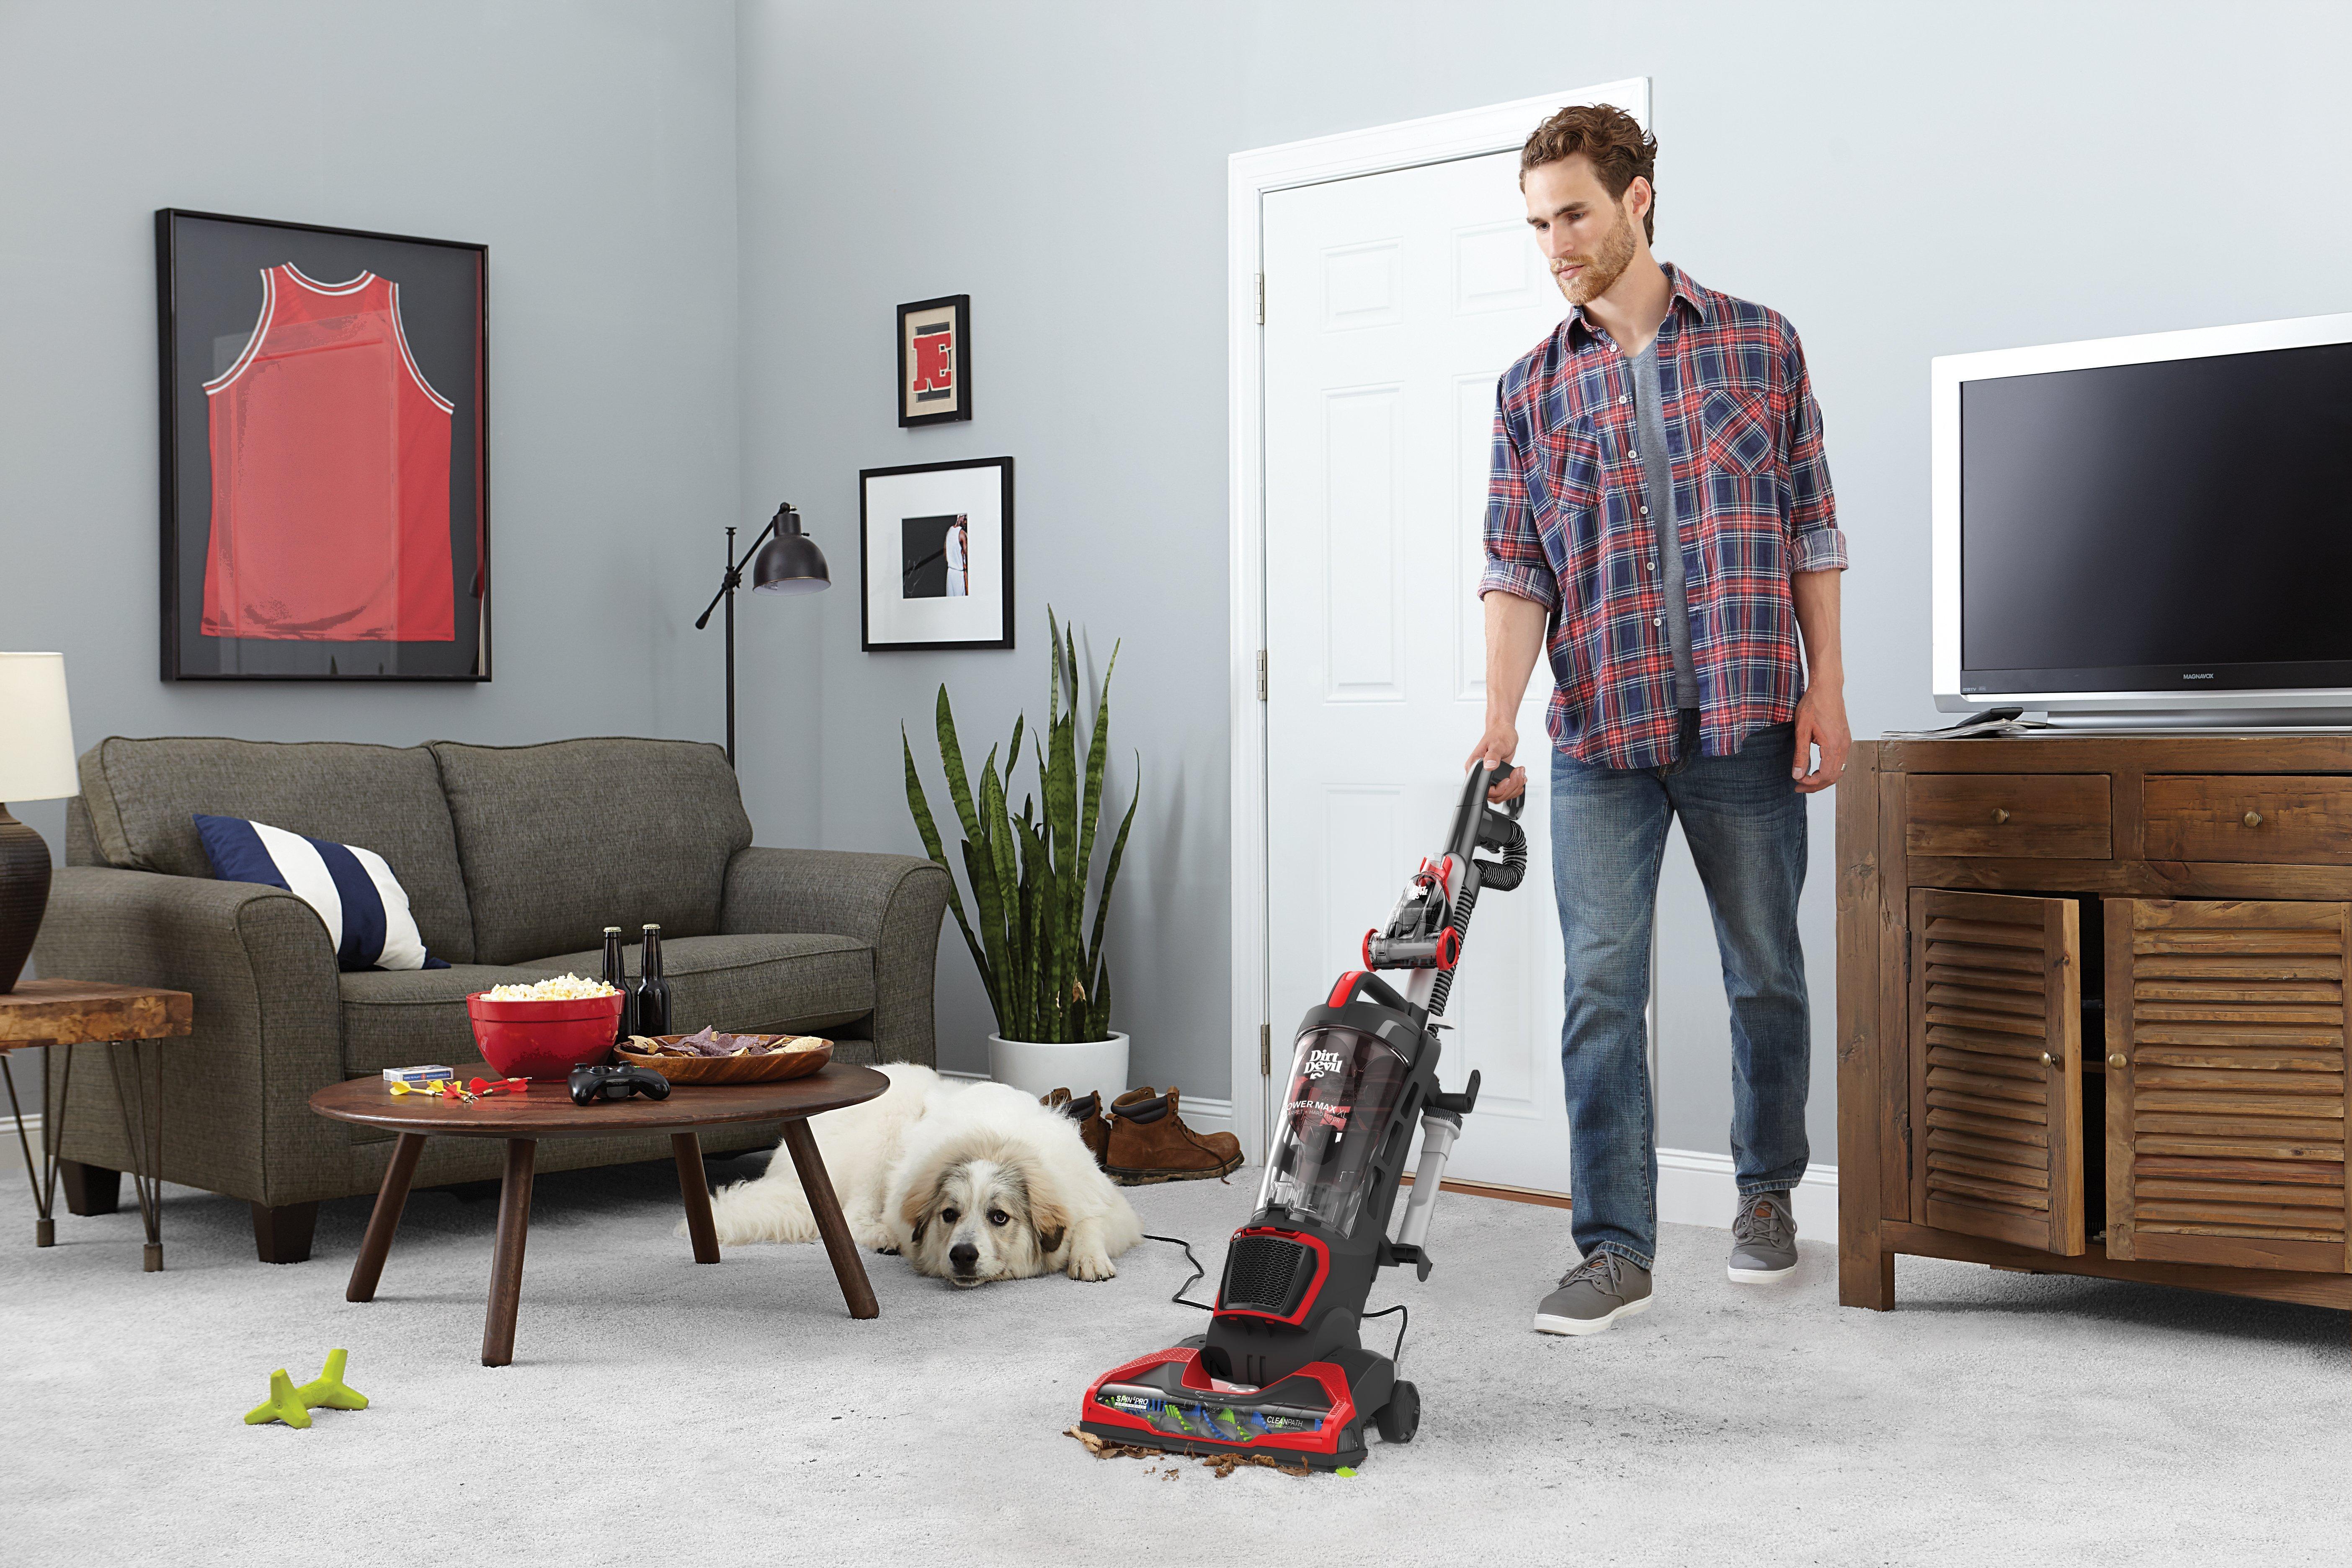 Power Max XL Upright Vacuum3